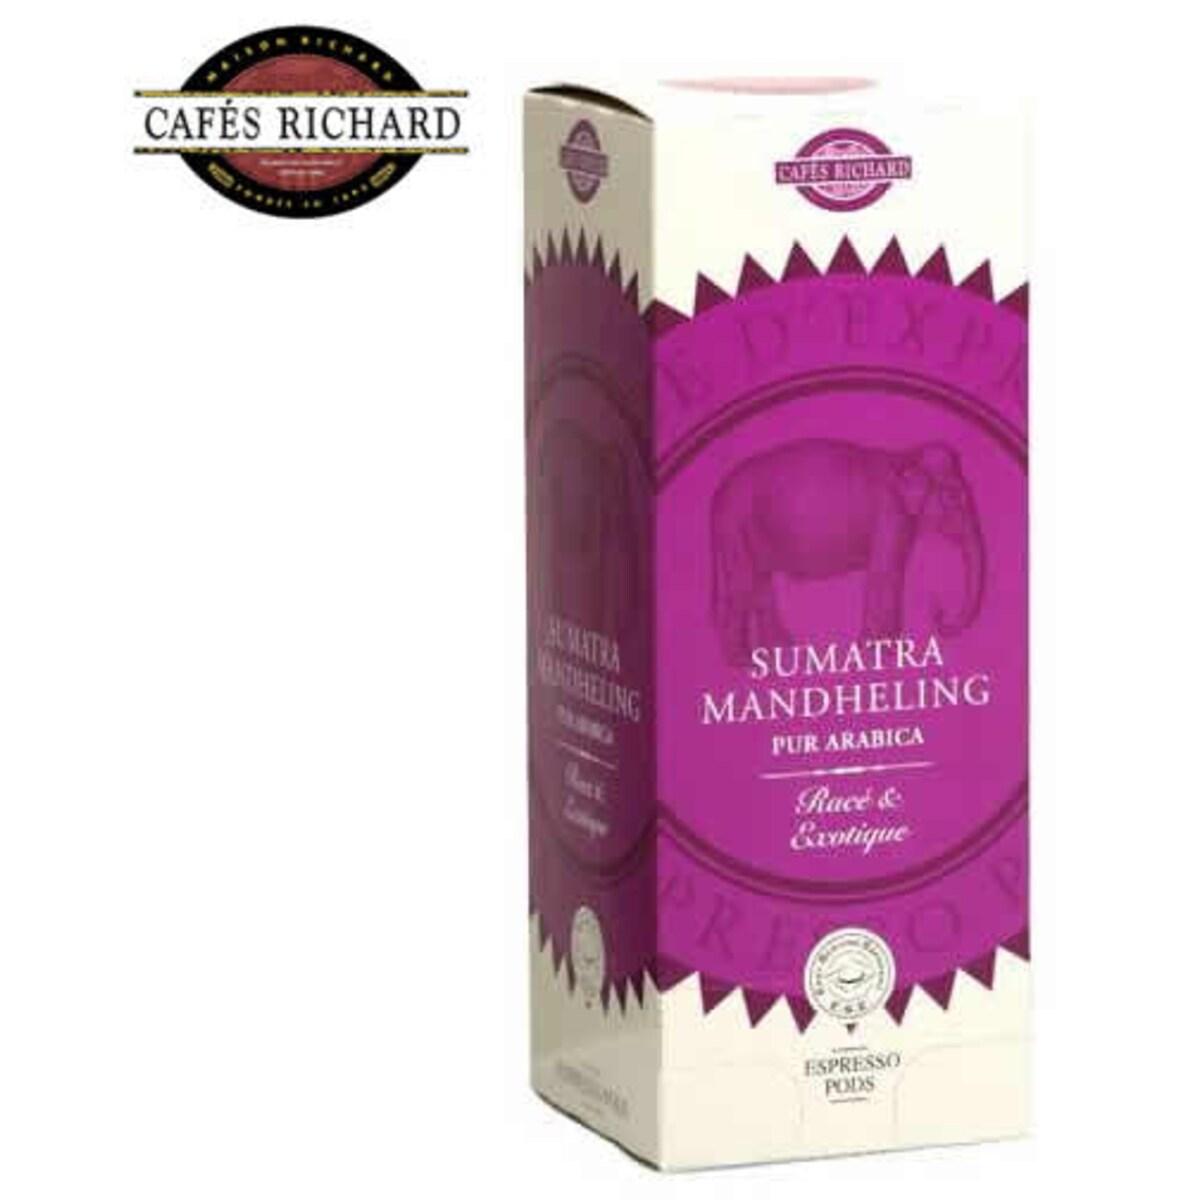 Cafés Richard Sumatra Mandheling - дози